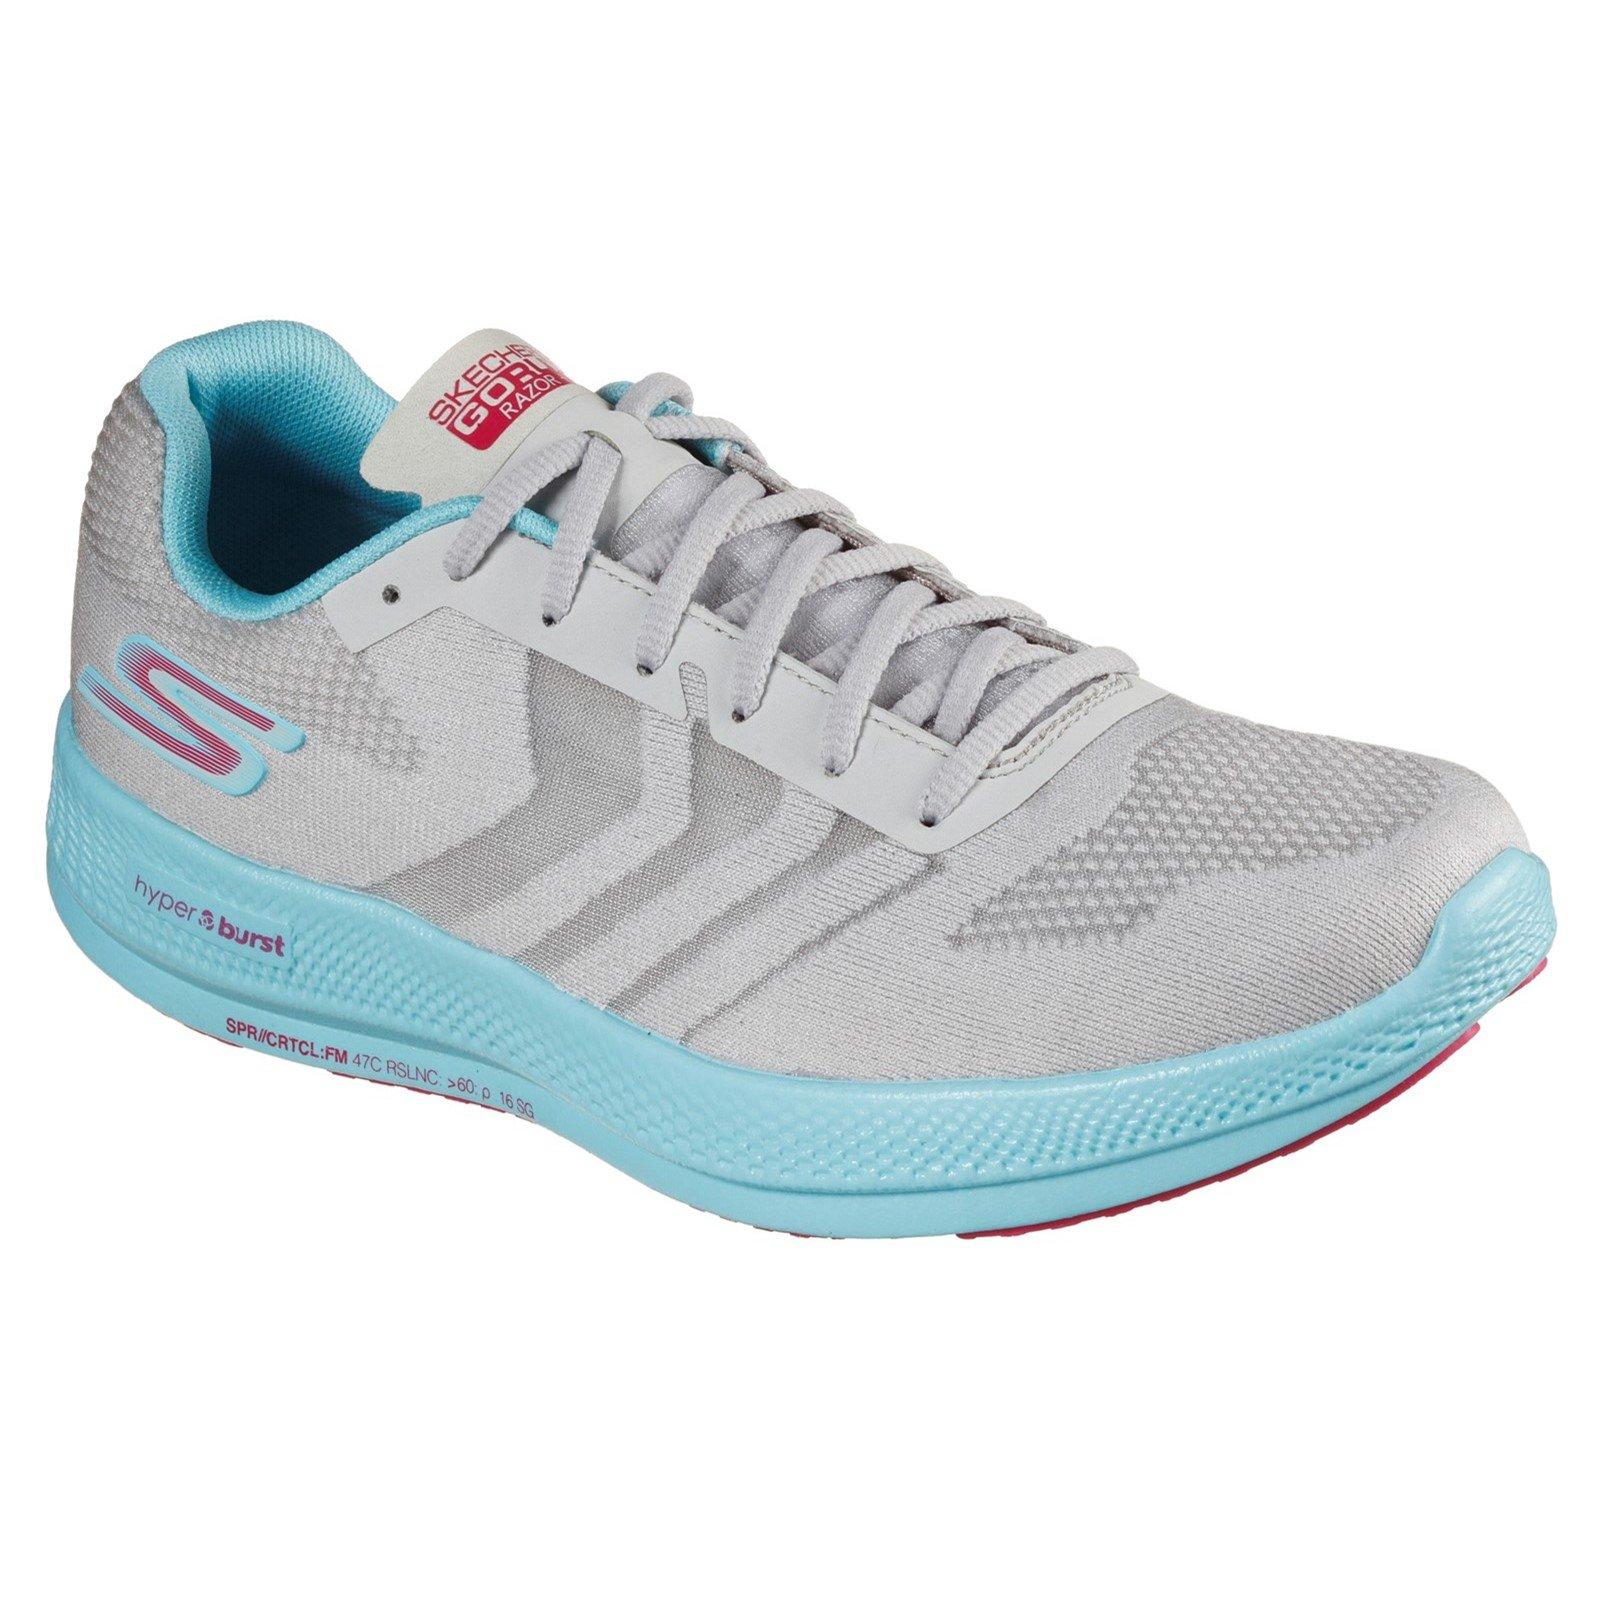 Skechers Women's Go Run Razor Trainer Various Colours 32703 - Grey/Aqua/Pink 5